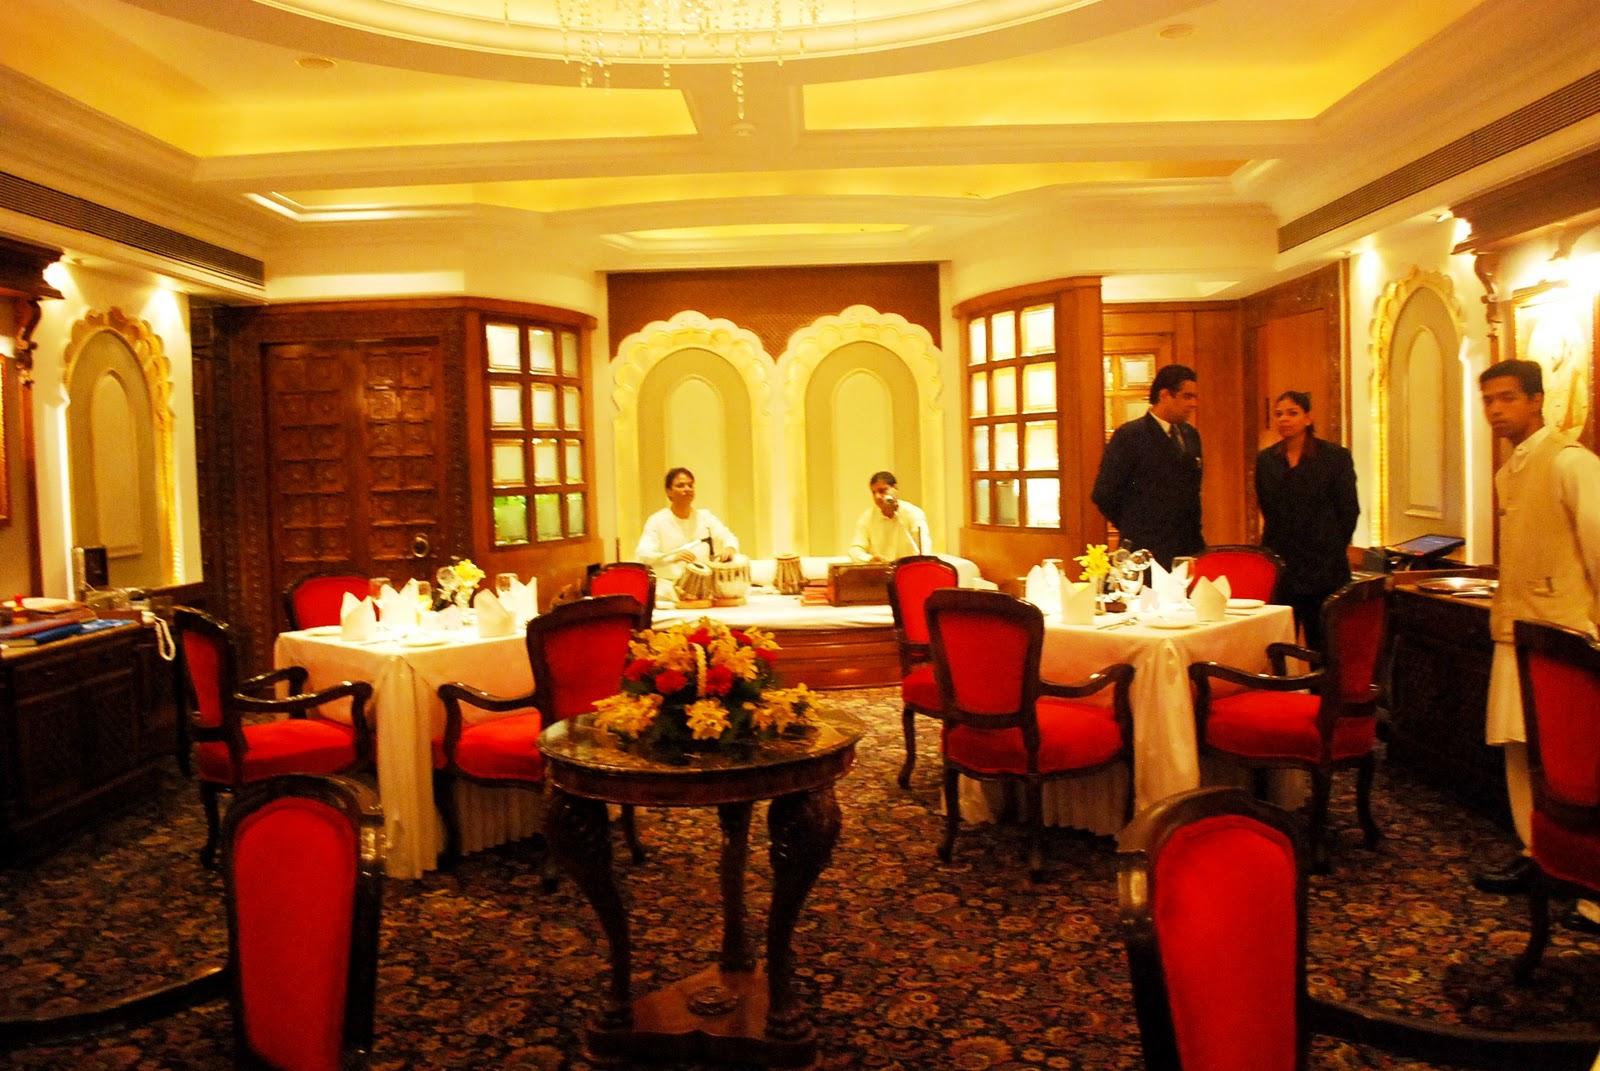 Hotels and restaurants shagun restaurant sea princess for Bistro hotel